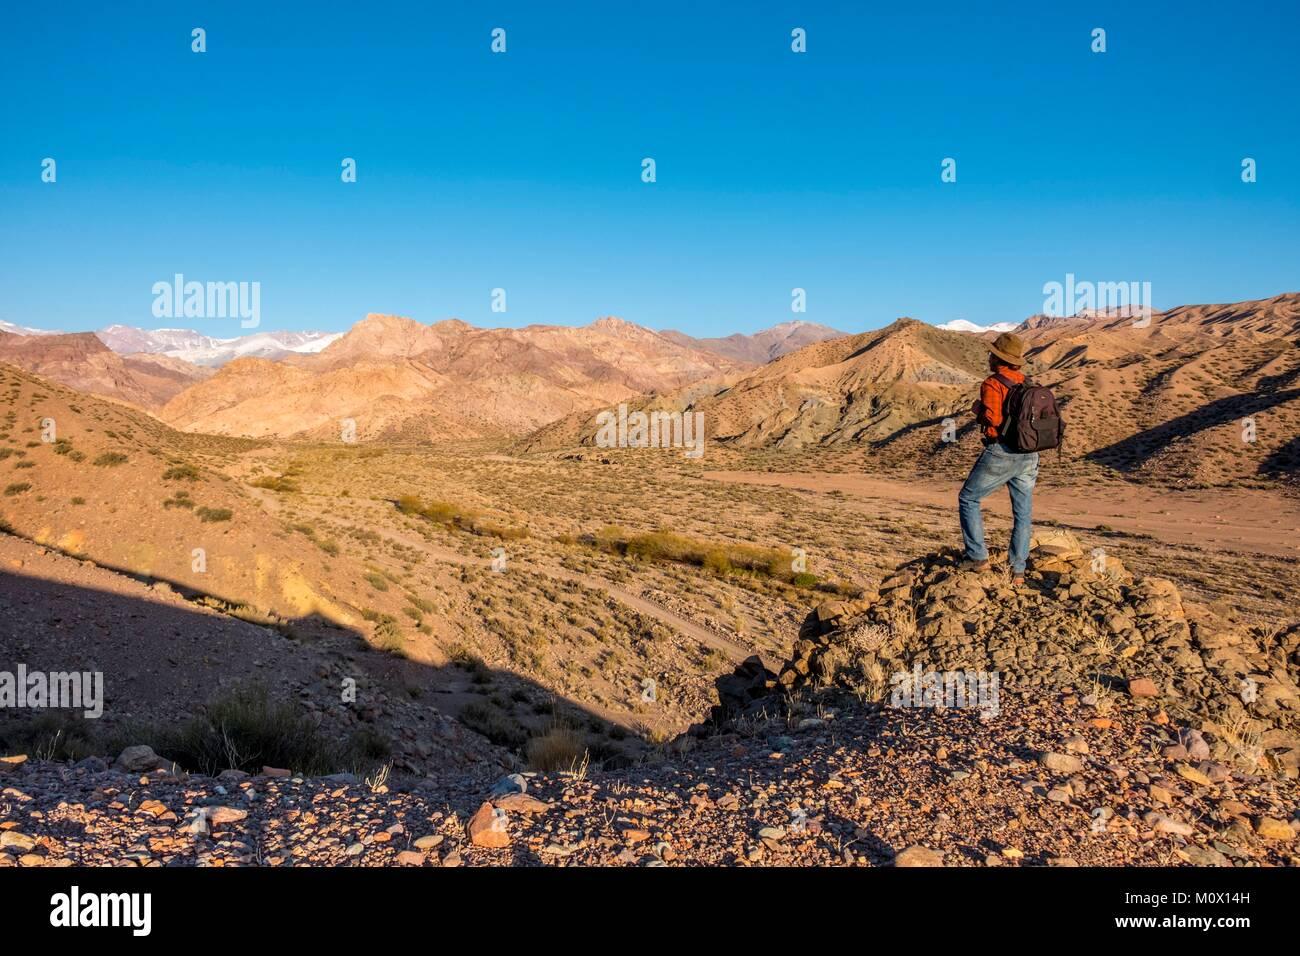 Argentina, provincia de San Juan, Calingasta,Río Valle de Calingasta Foto de stock